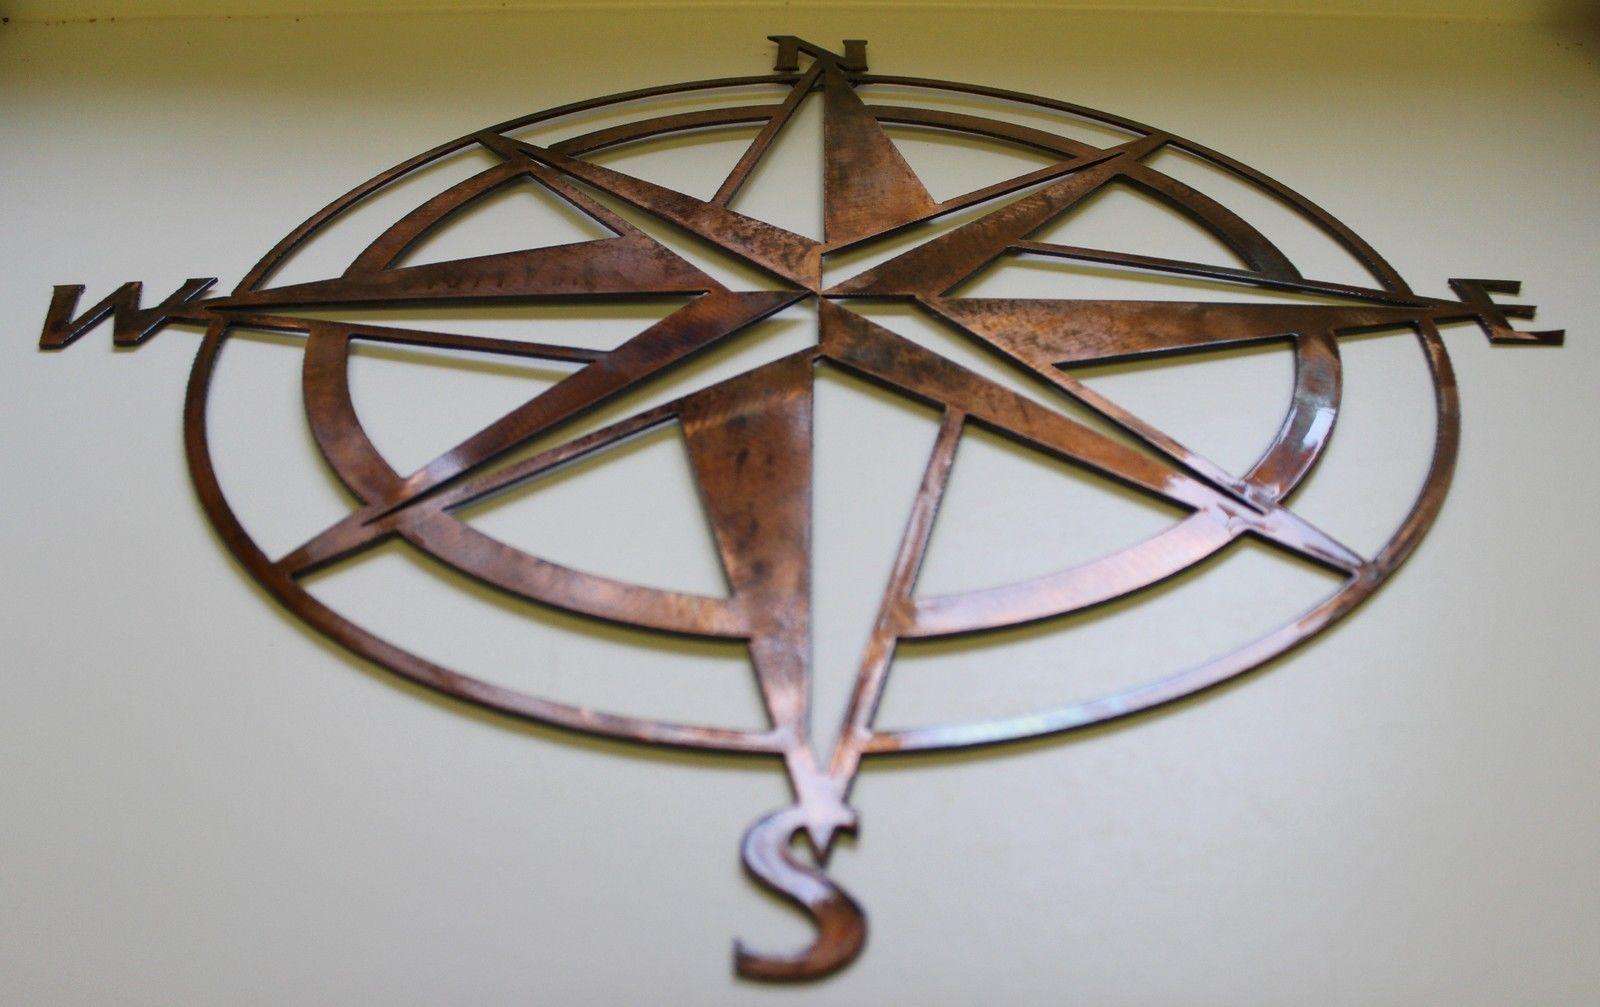 Nautical Compass Wall Decor : Nautical compass rose wall art decor quot copper bronze